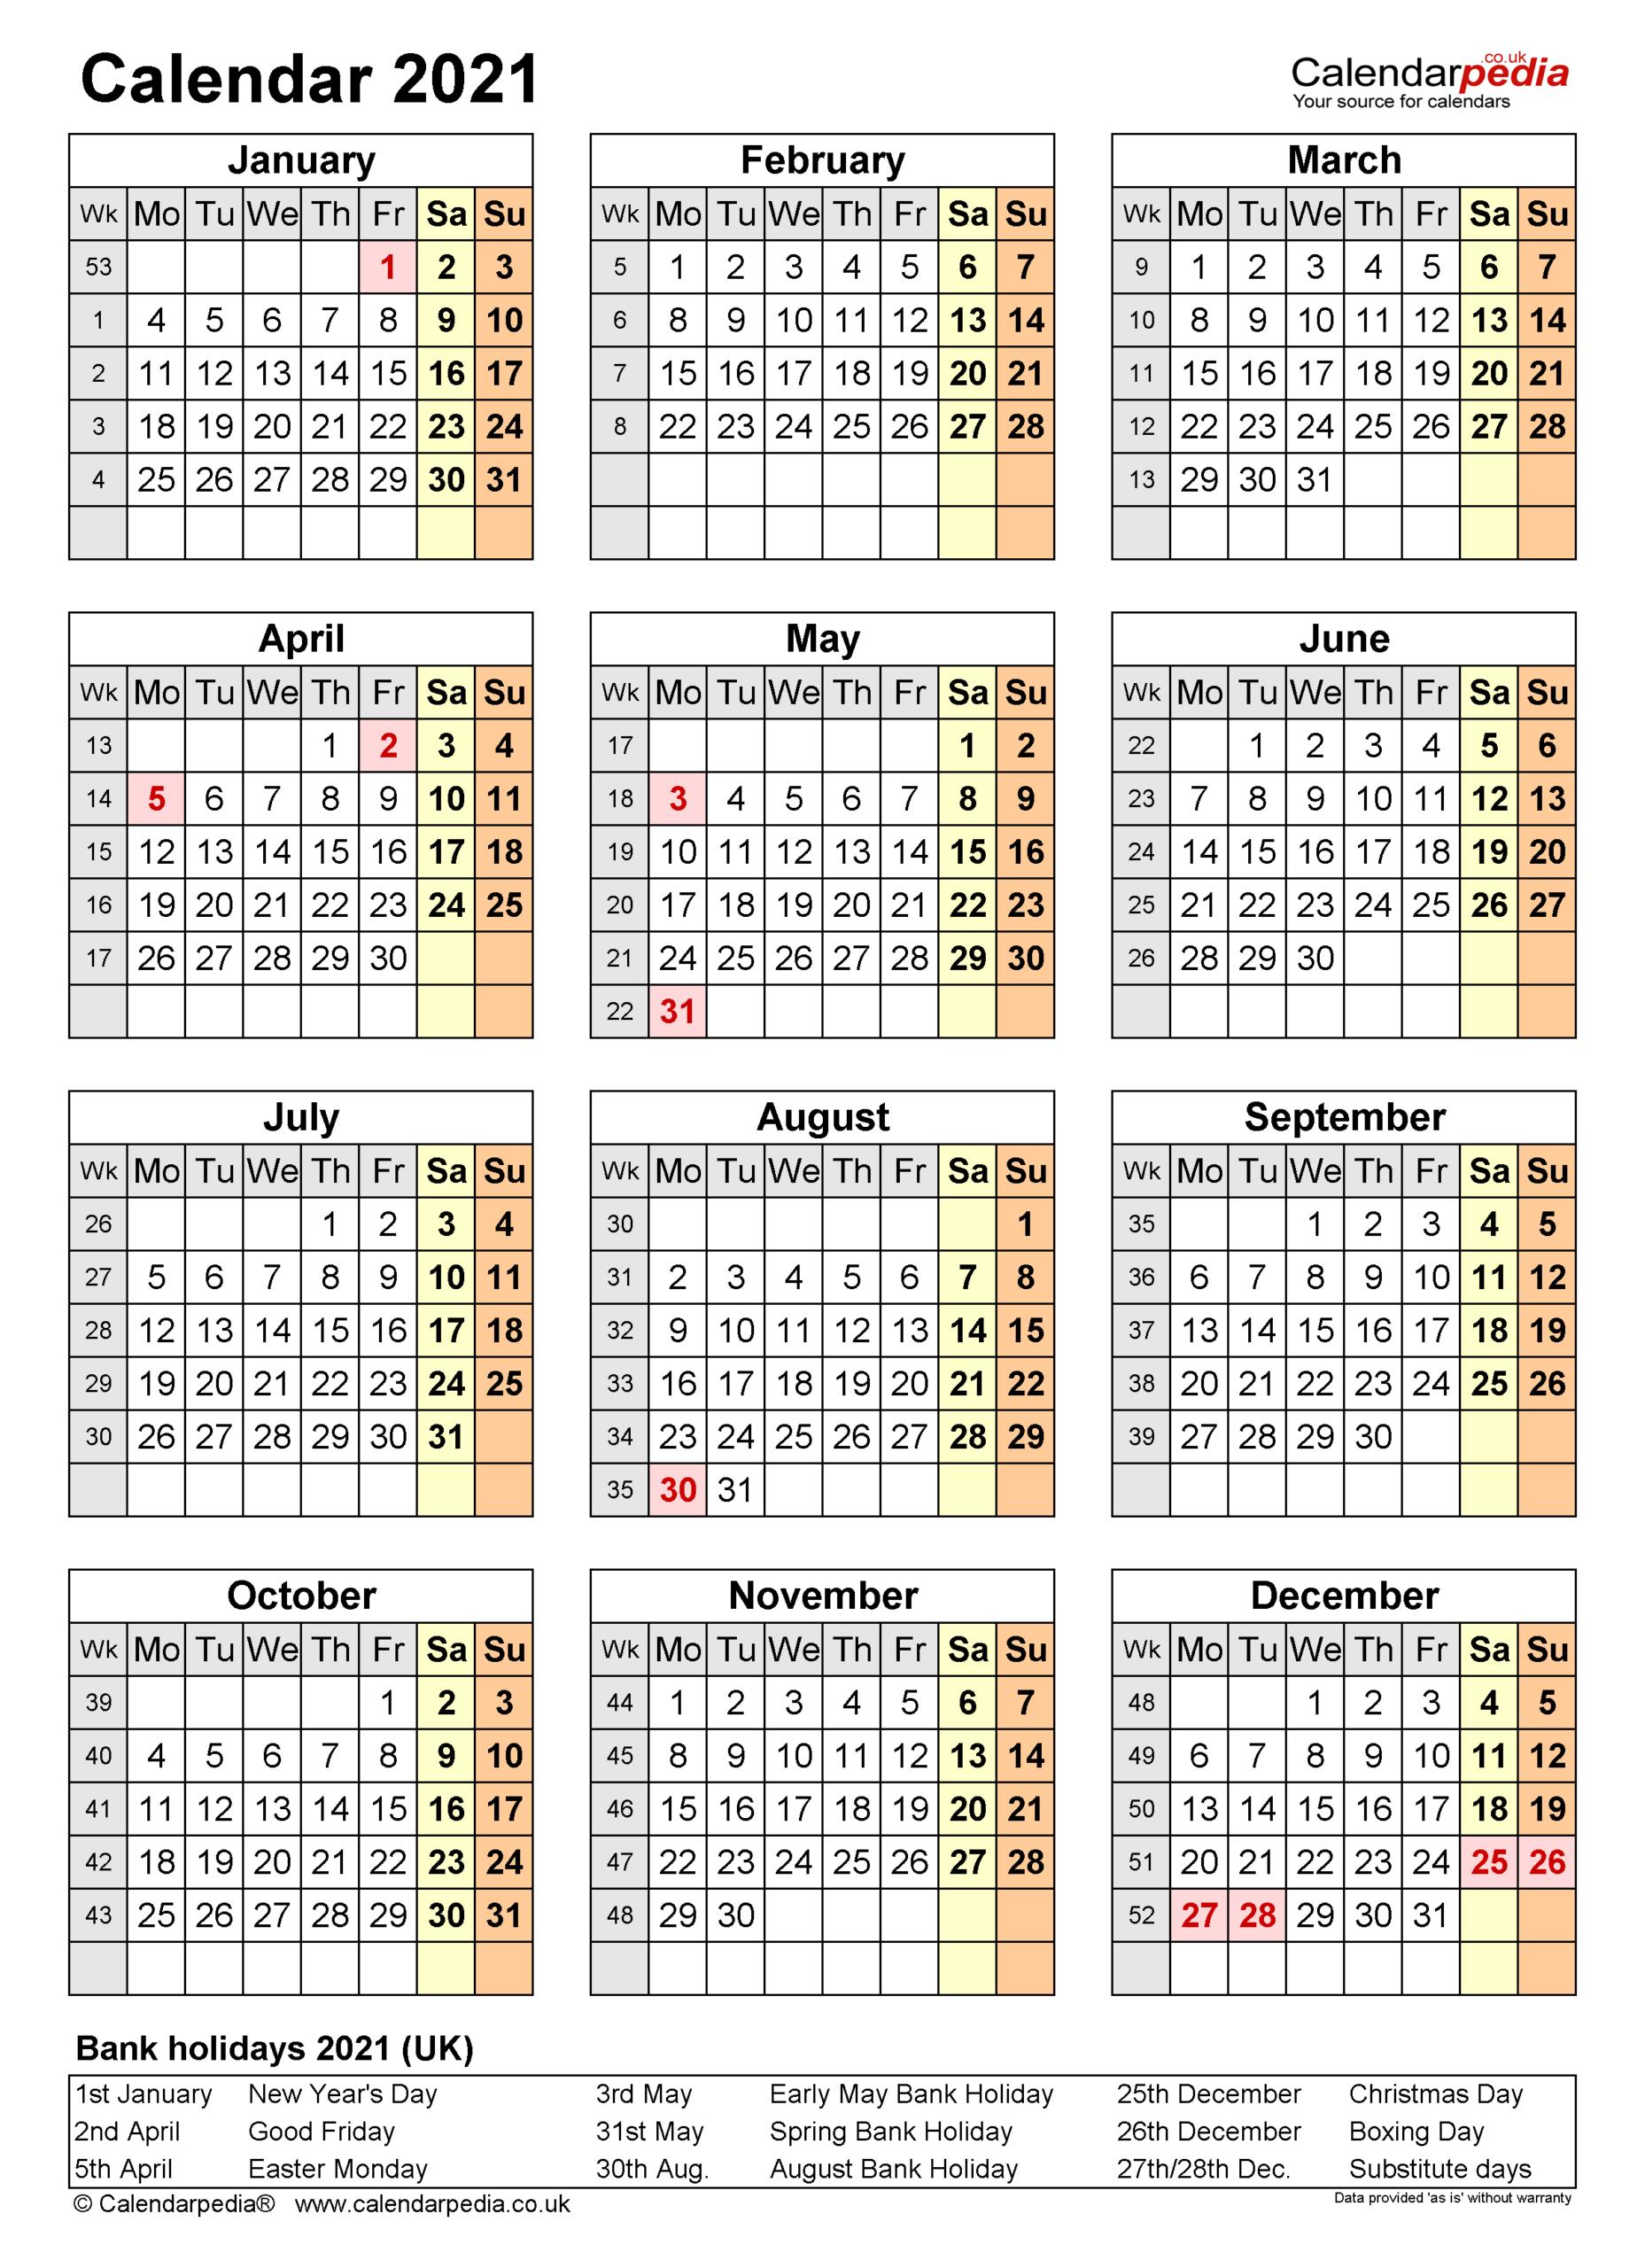 Calendar 2021 (Uk) - Free Printable Microsoft Excel Templates